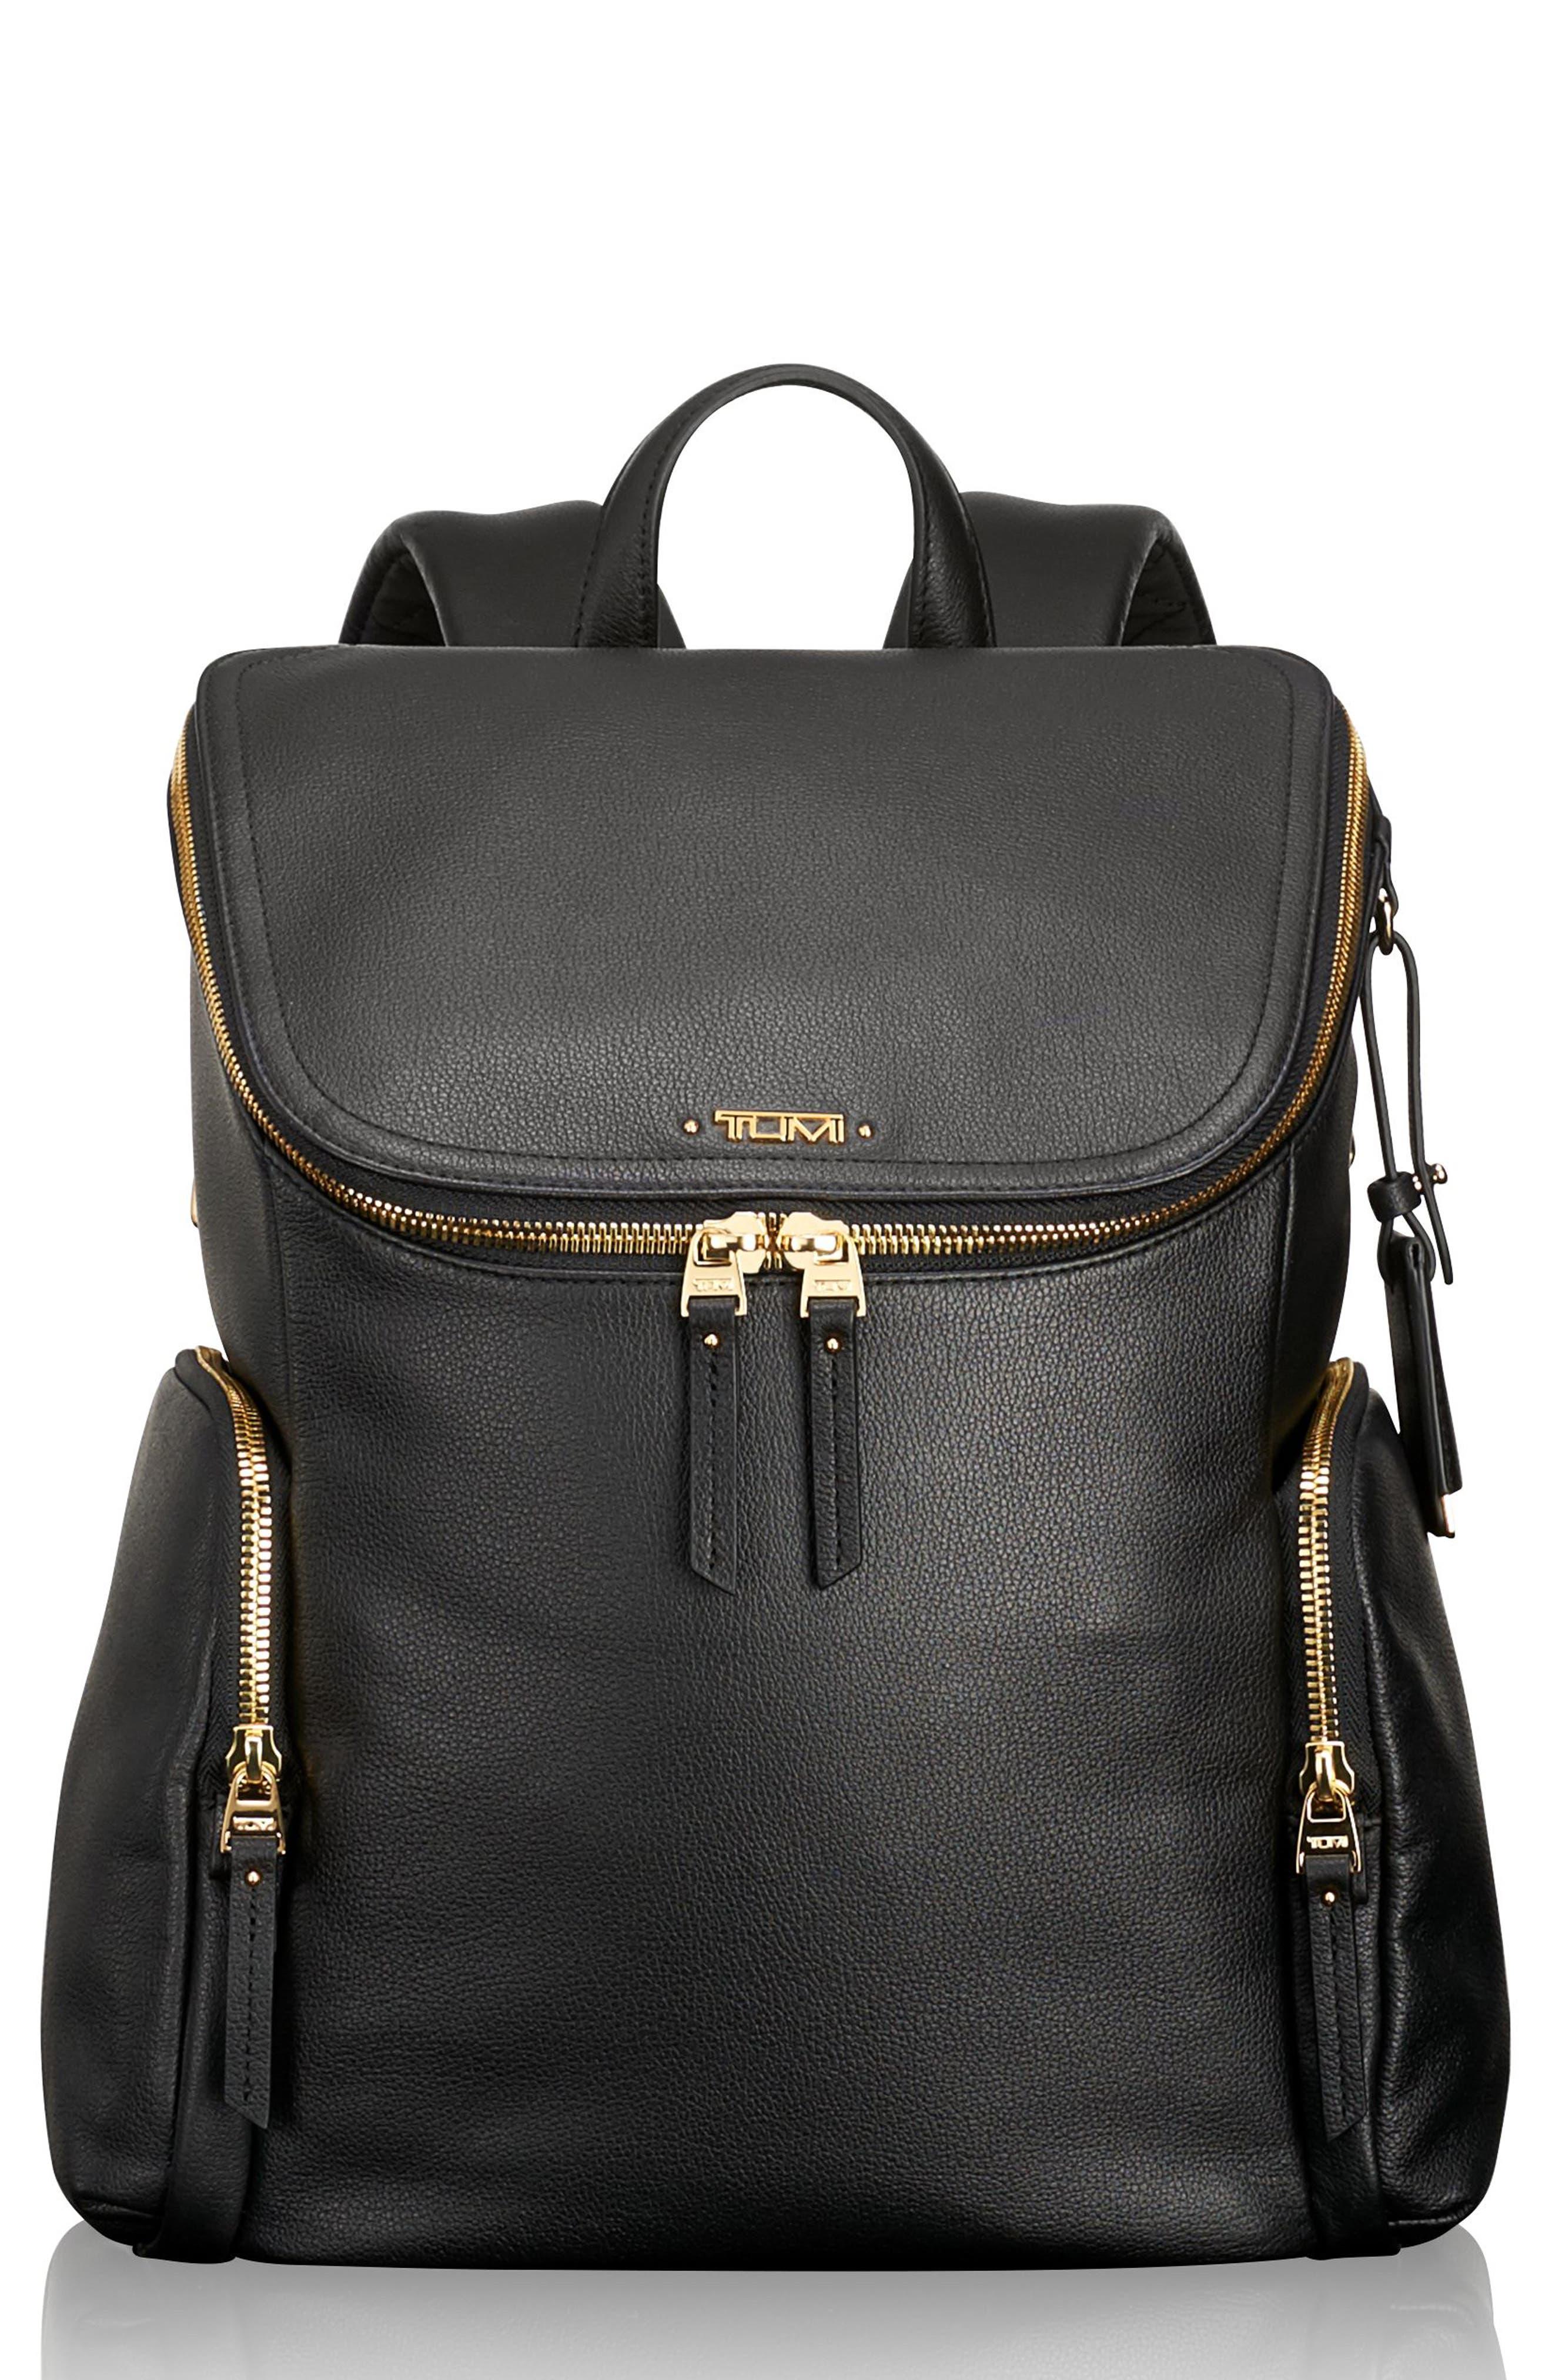 Tumi Voyageur Lexa Leather Backpack